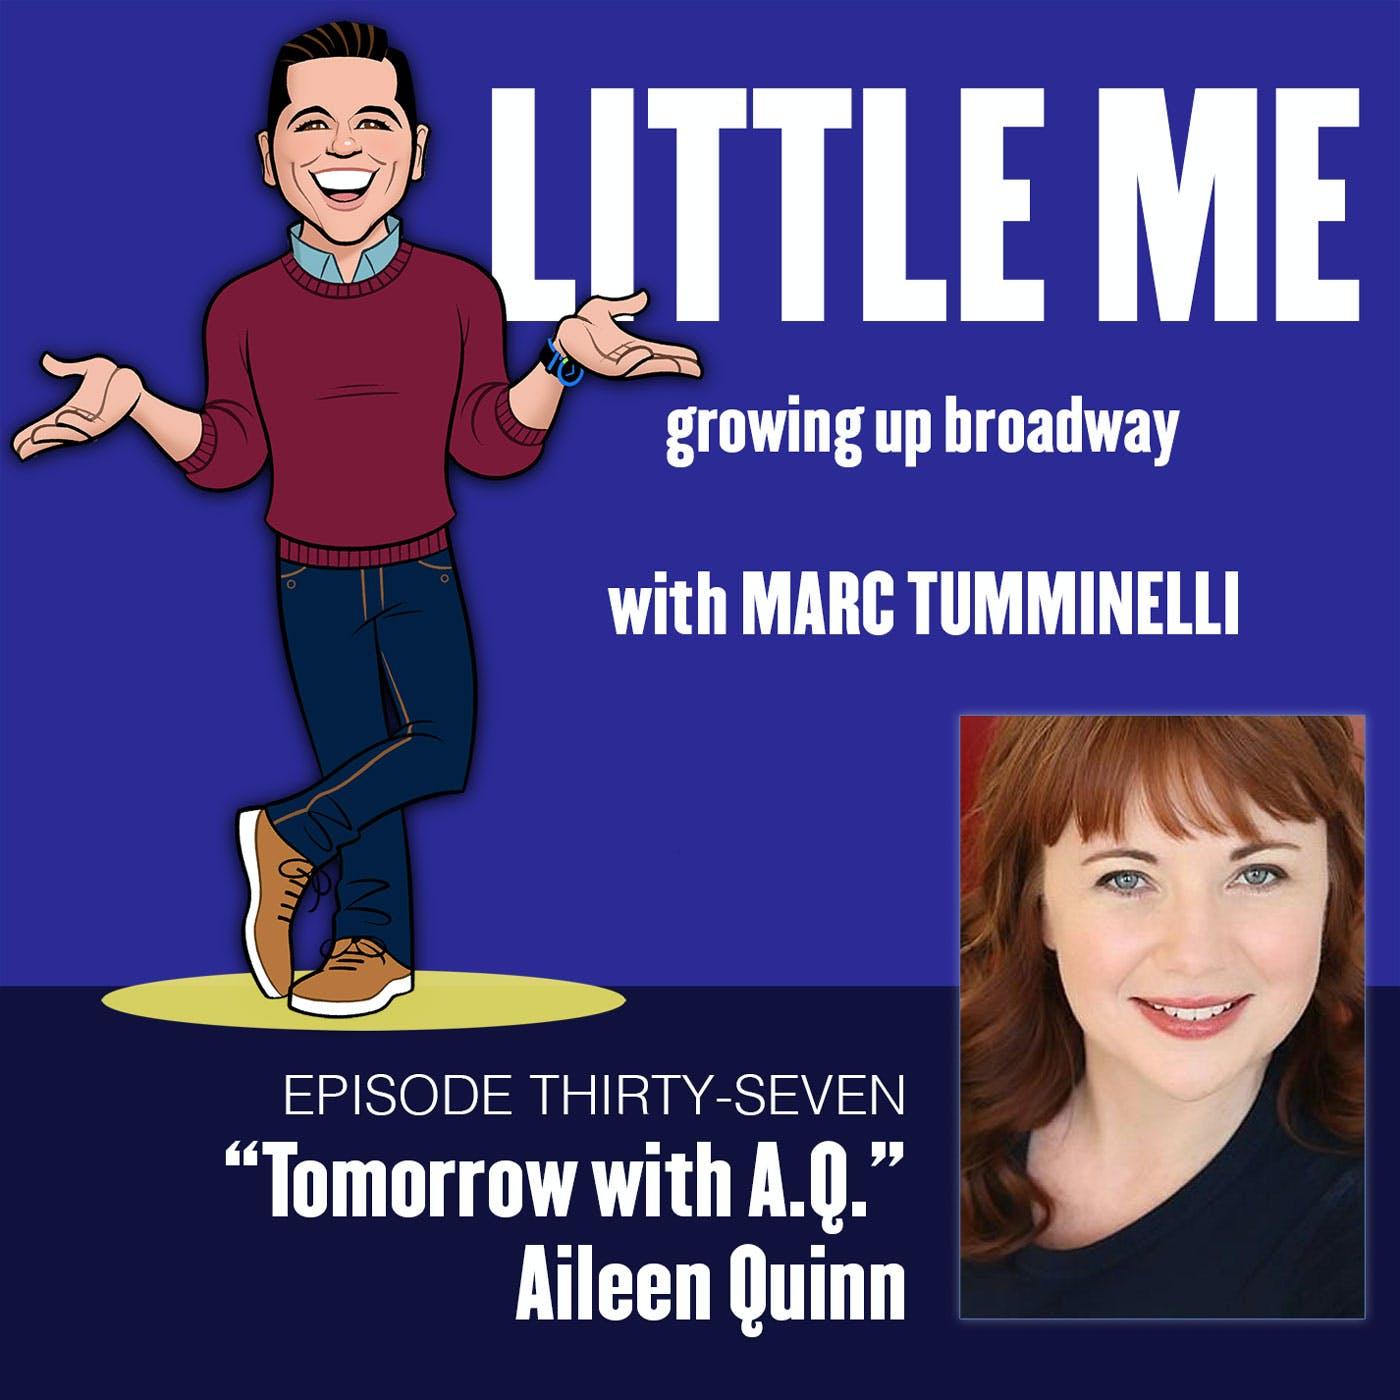 EP37 - Aileen Quinn - Tomorrow with A.Q.